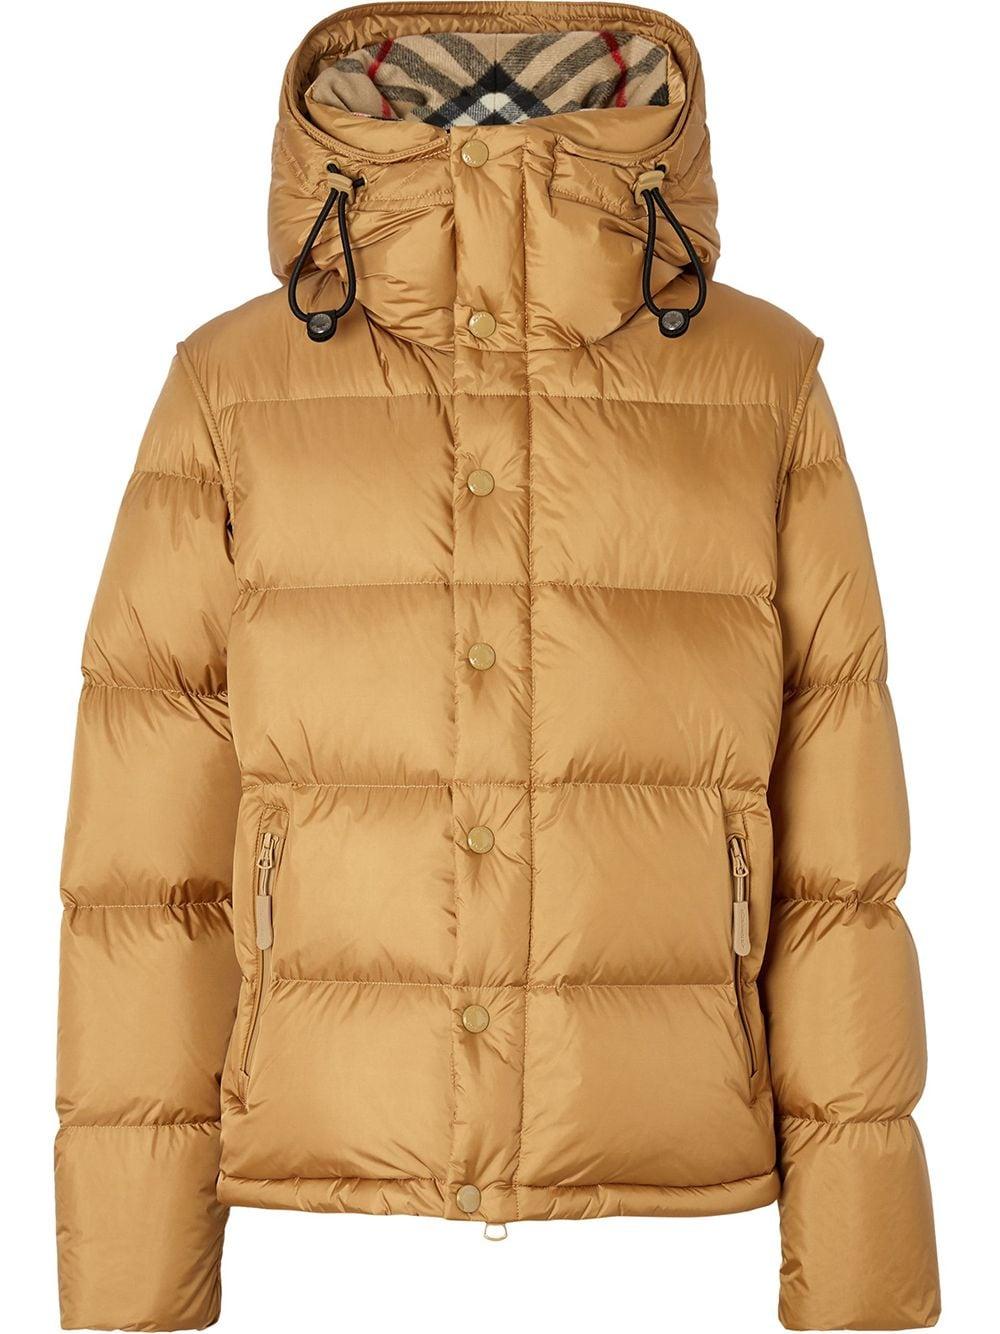 Lockwell Down Coat